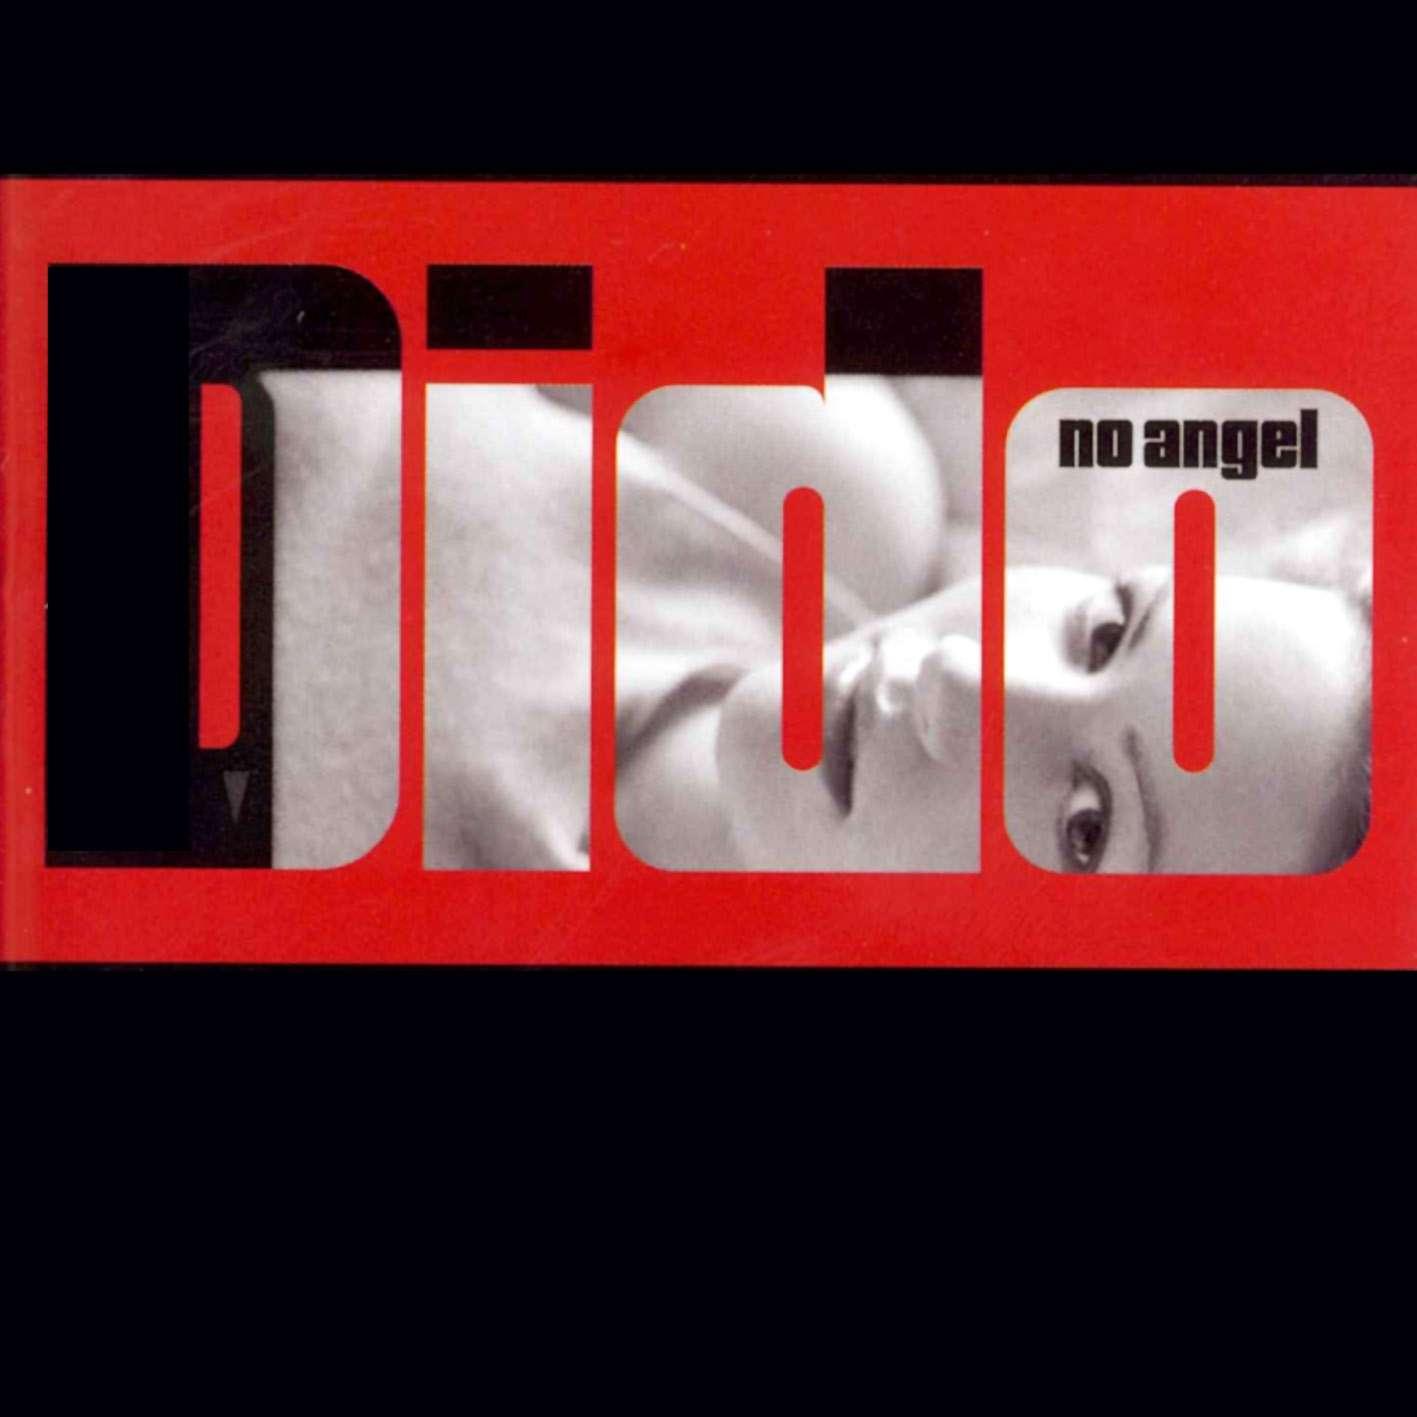 http://3.bp.blogspot.com/_ReWuEqRBpBE/TO3EmAEpIuI/AAAAAAAACrI/4ymGKGFGE5w/s1600/Dido+-+No+Angel.jpg